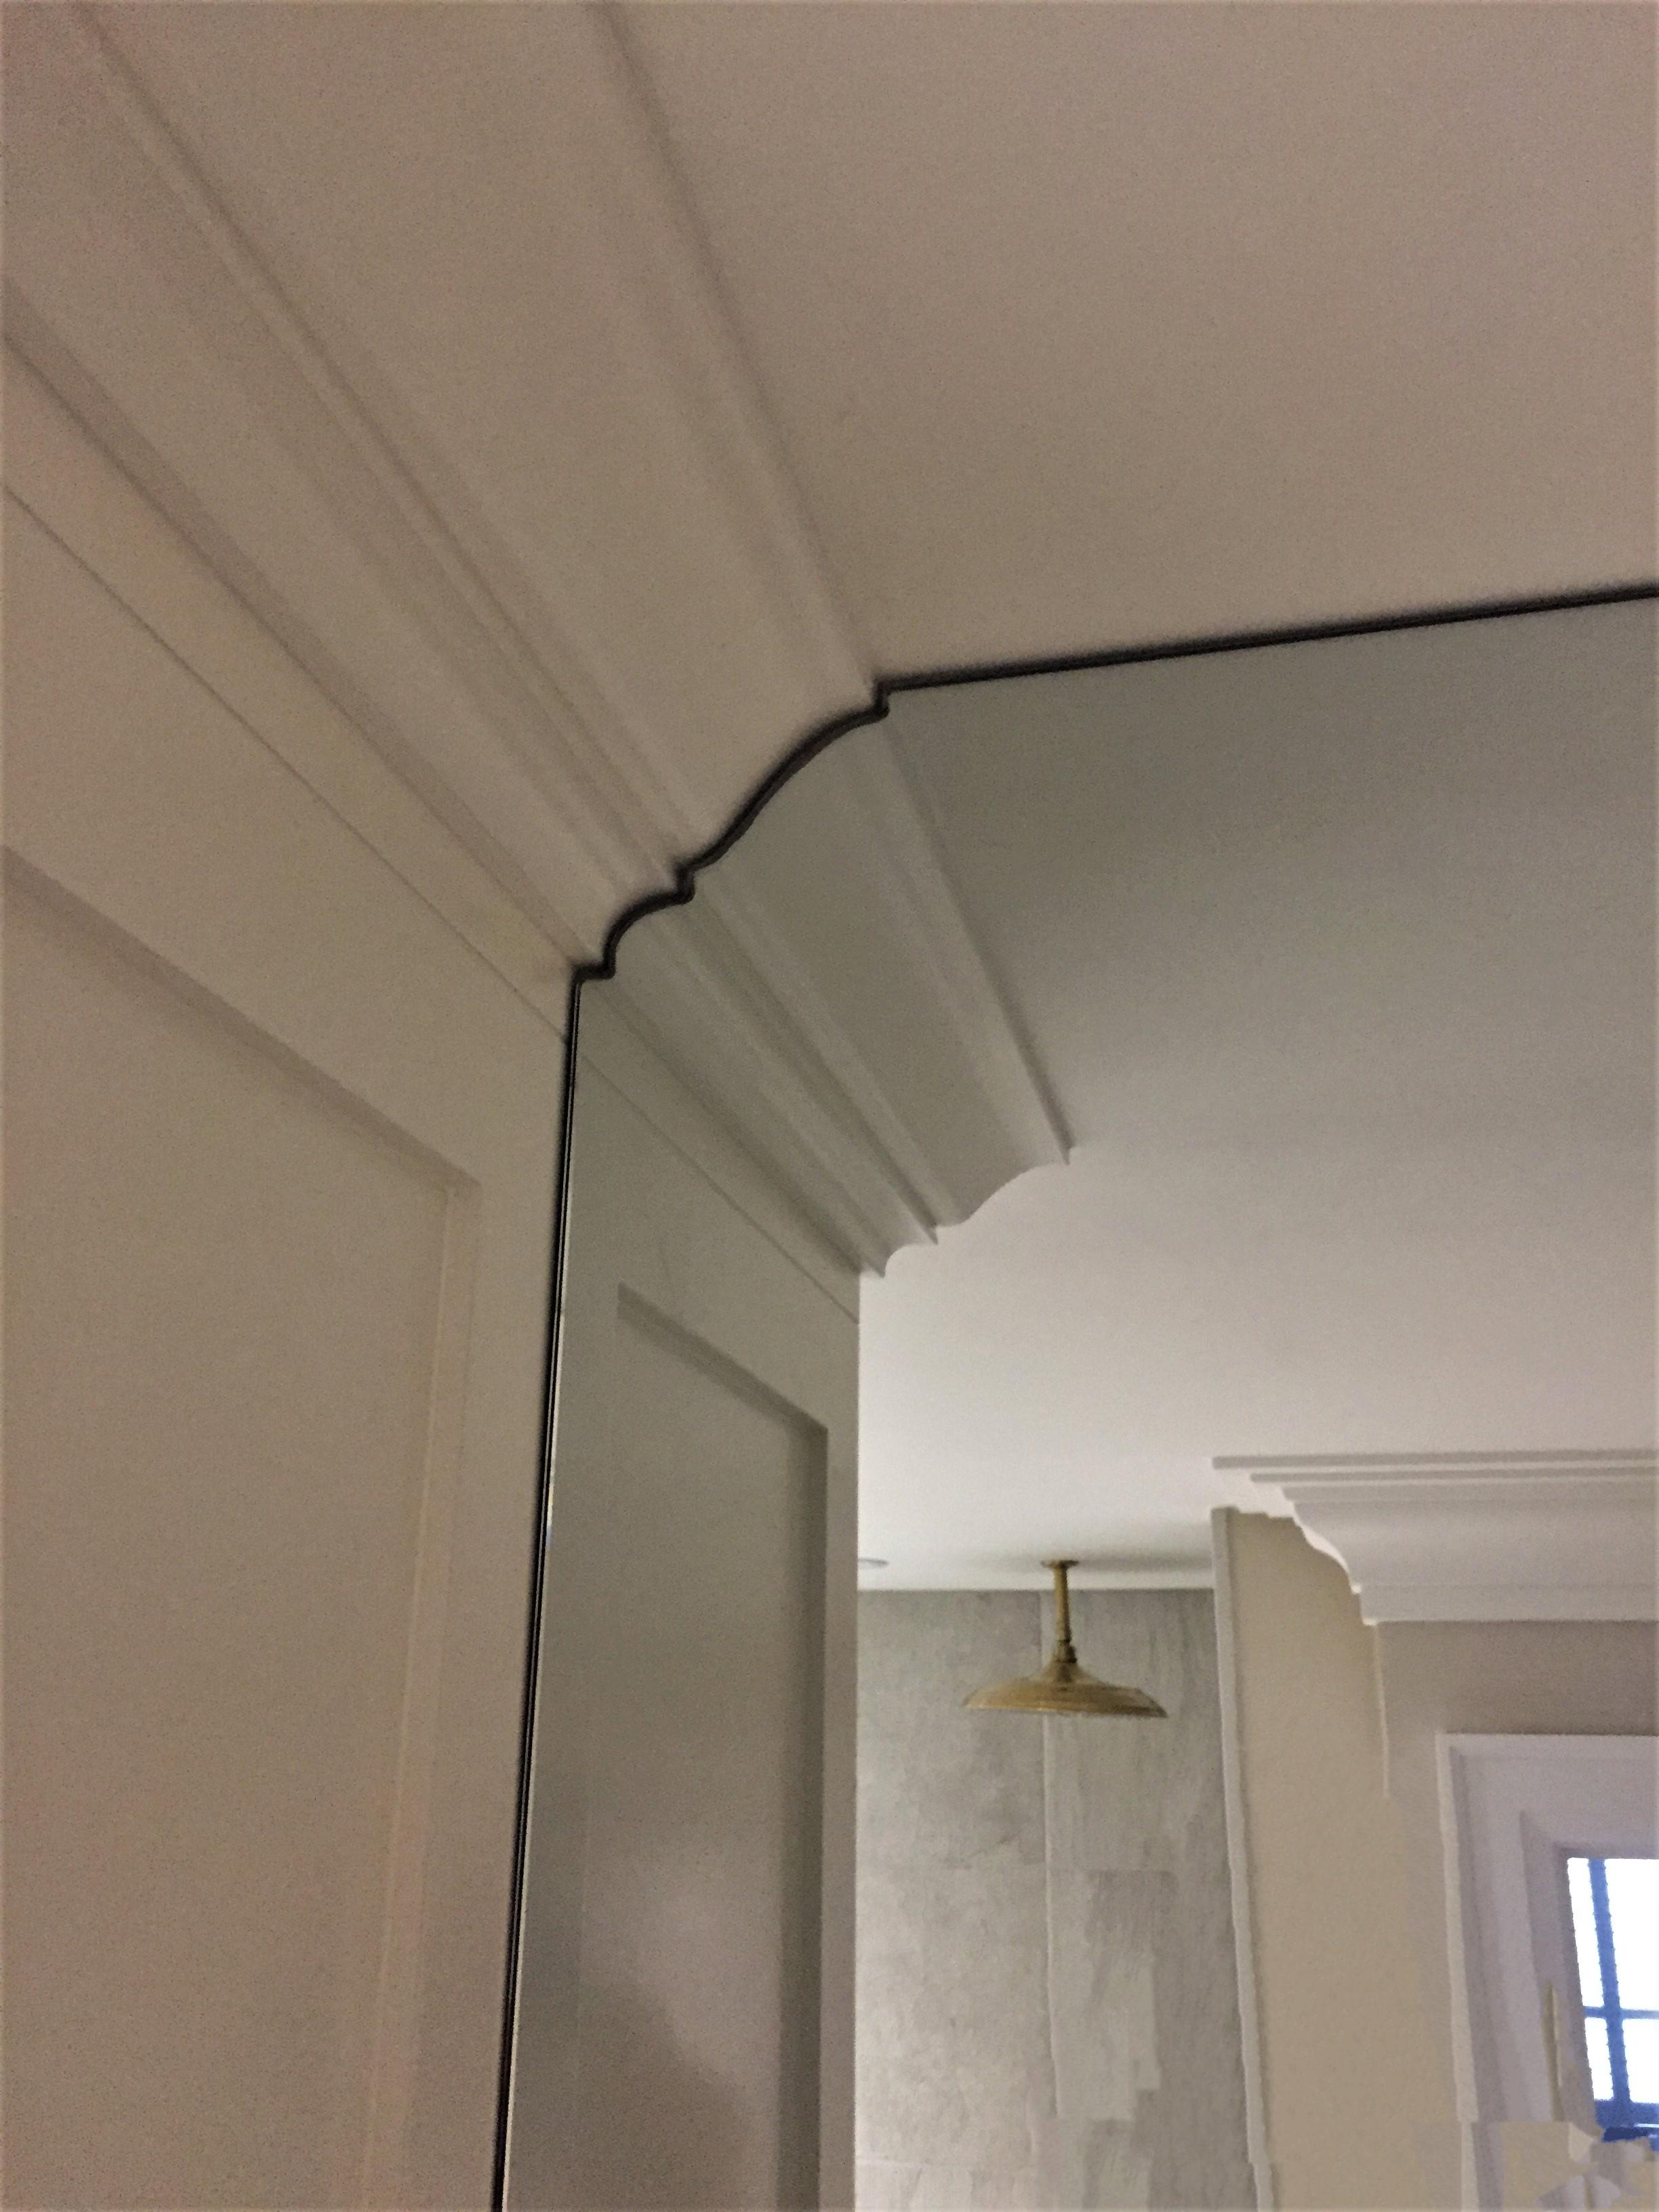 Mirrored wall